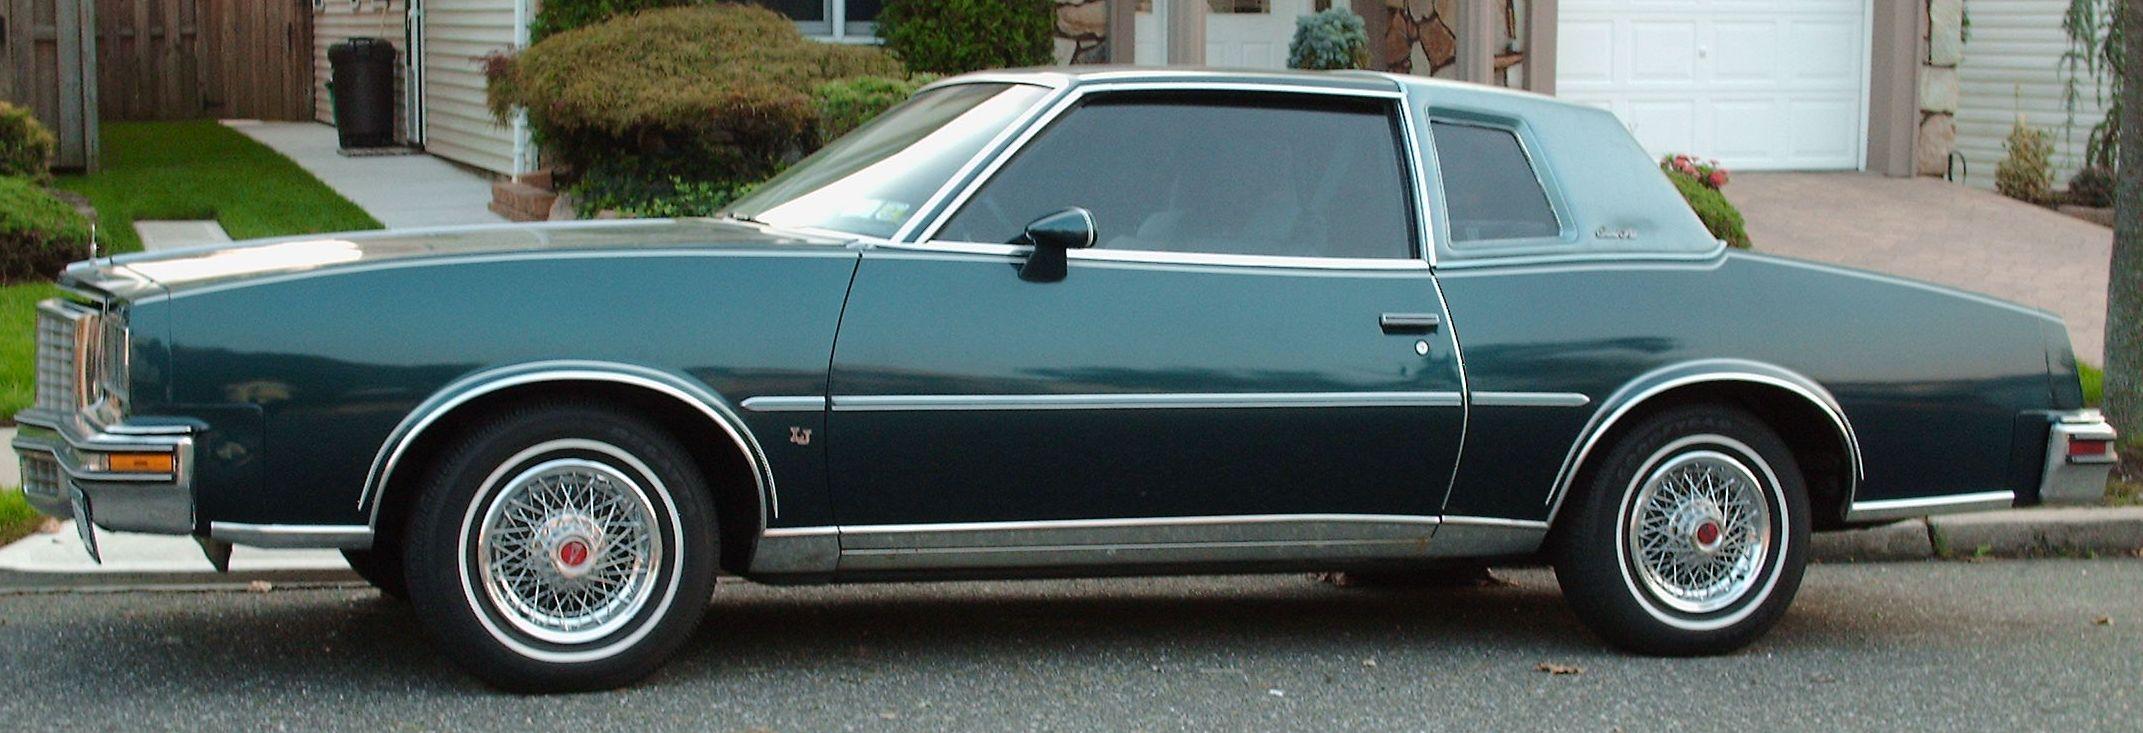 Pontiac pontiac gxp specs : Curbside Classic: 1978 Pontiac Grand Prix – GM's Deadly Sin #14 ...